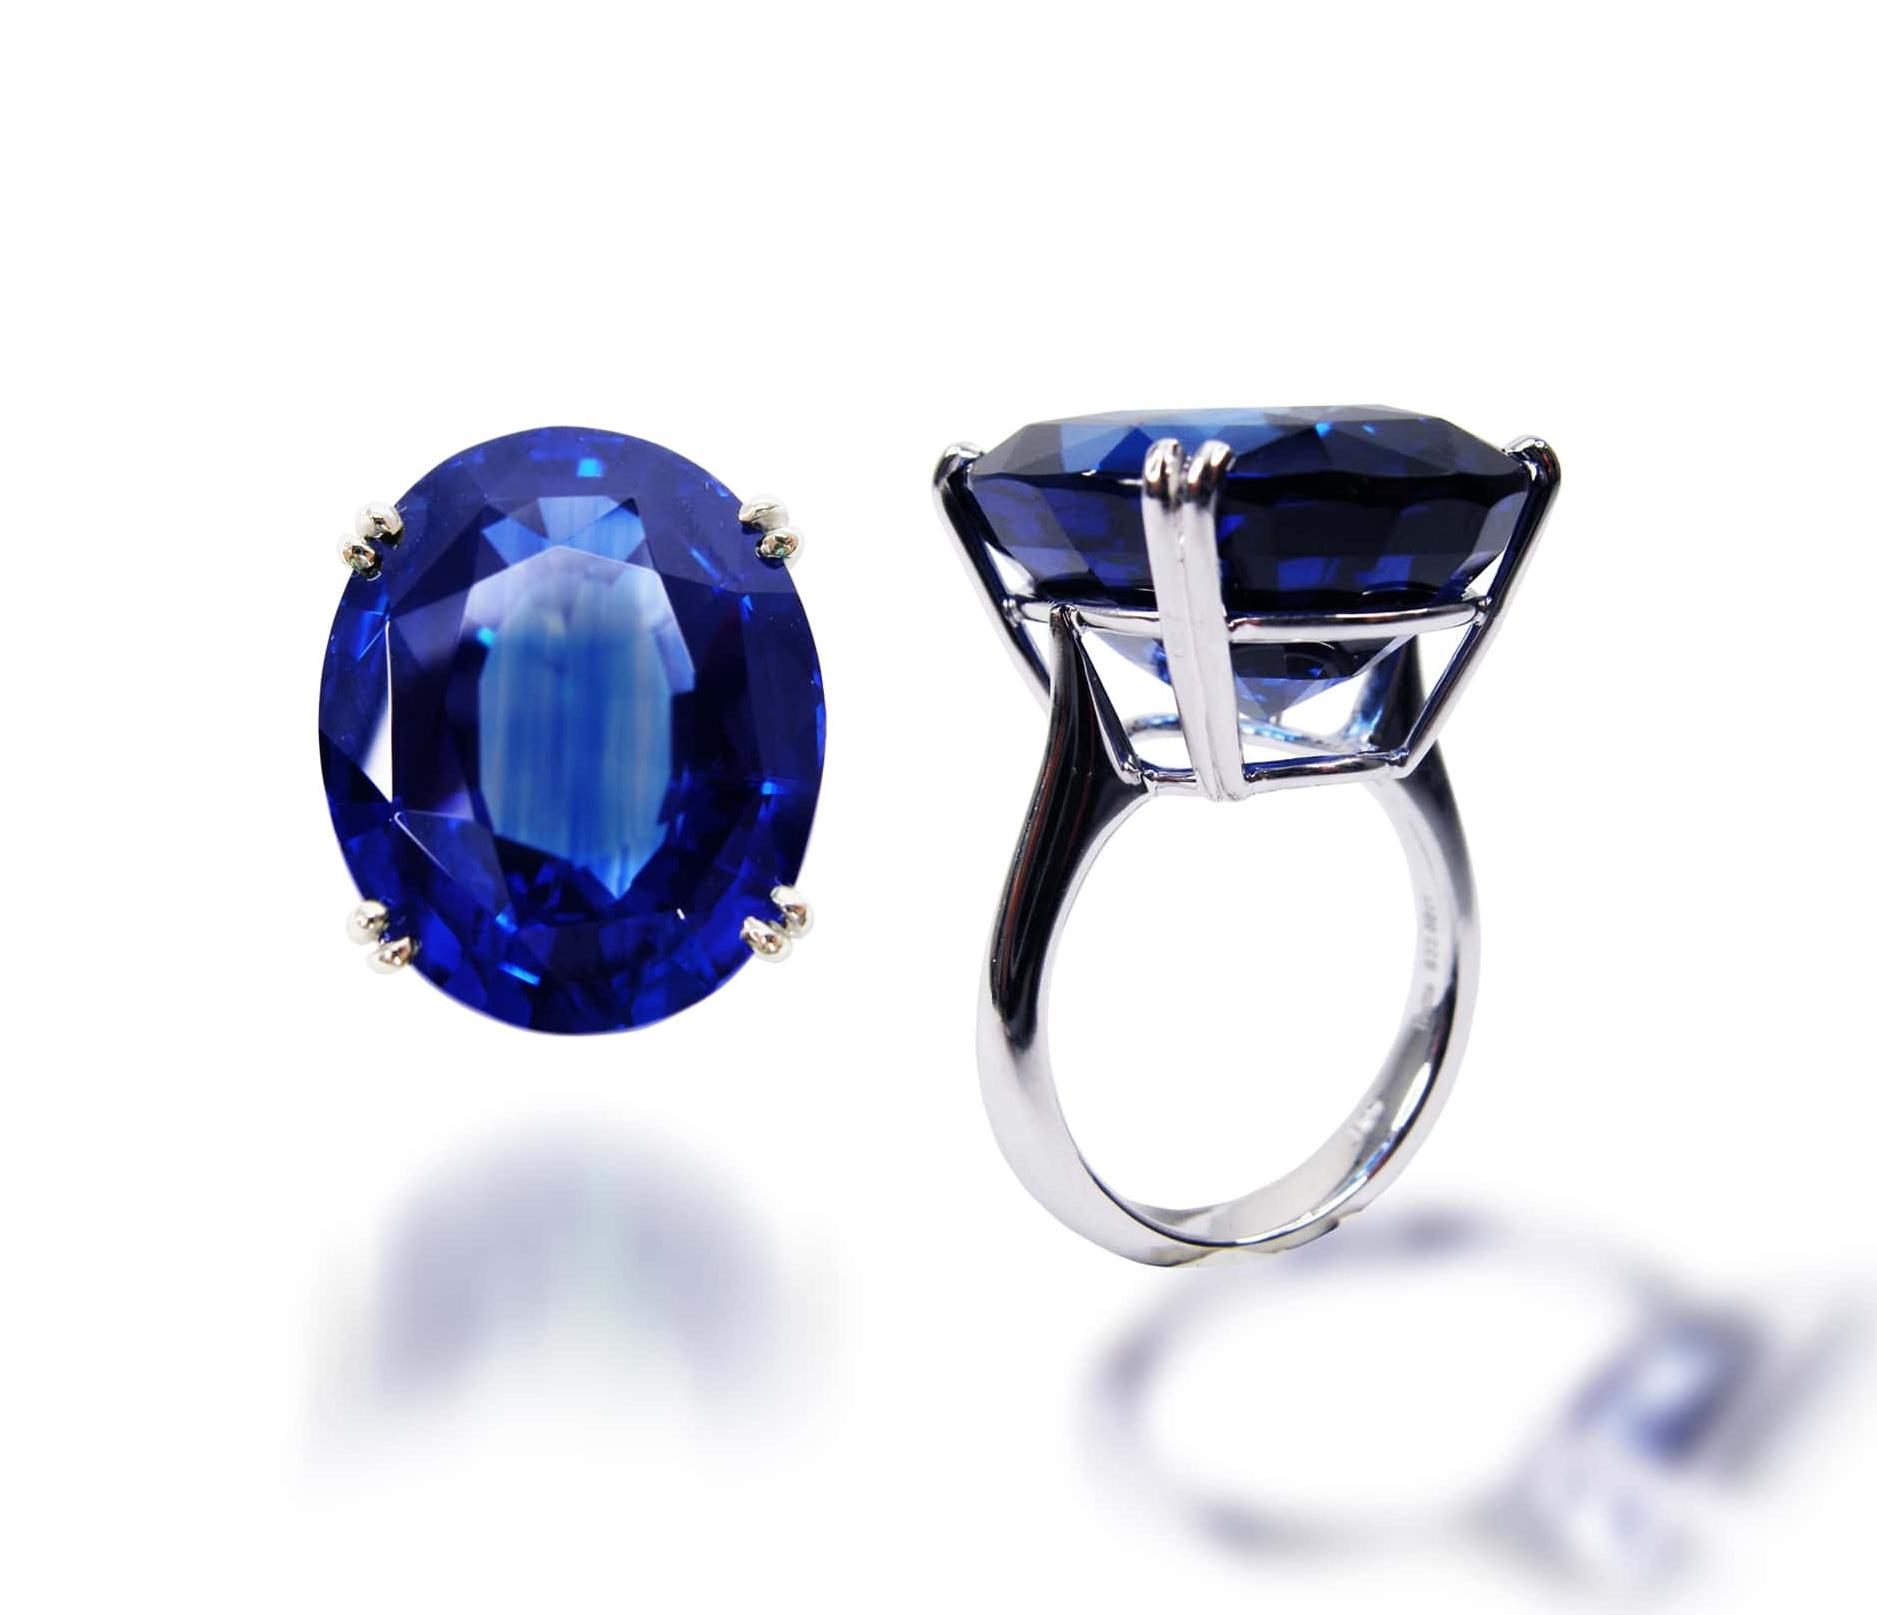 BLUE SAPPHIRE SOLITAIRE RING BESPOKE FINE JEWELLERY BY SHAHINA HATTA